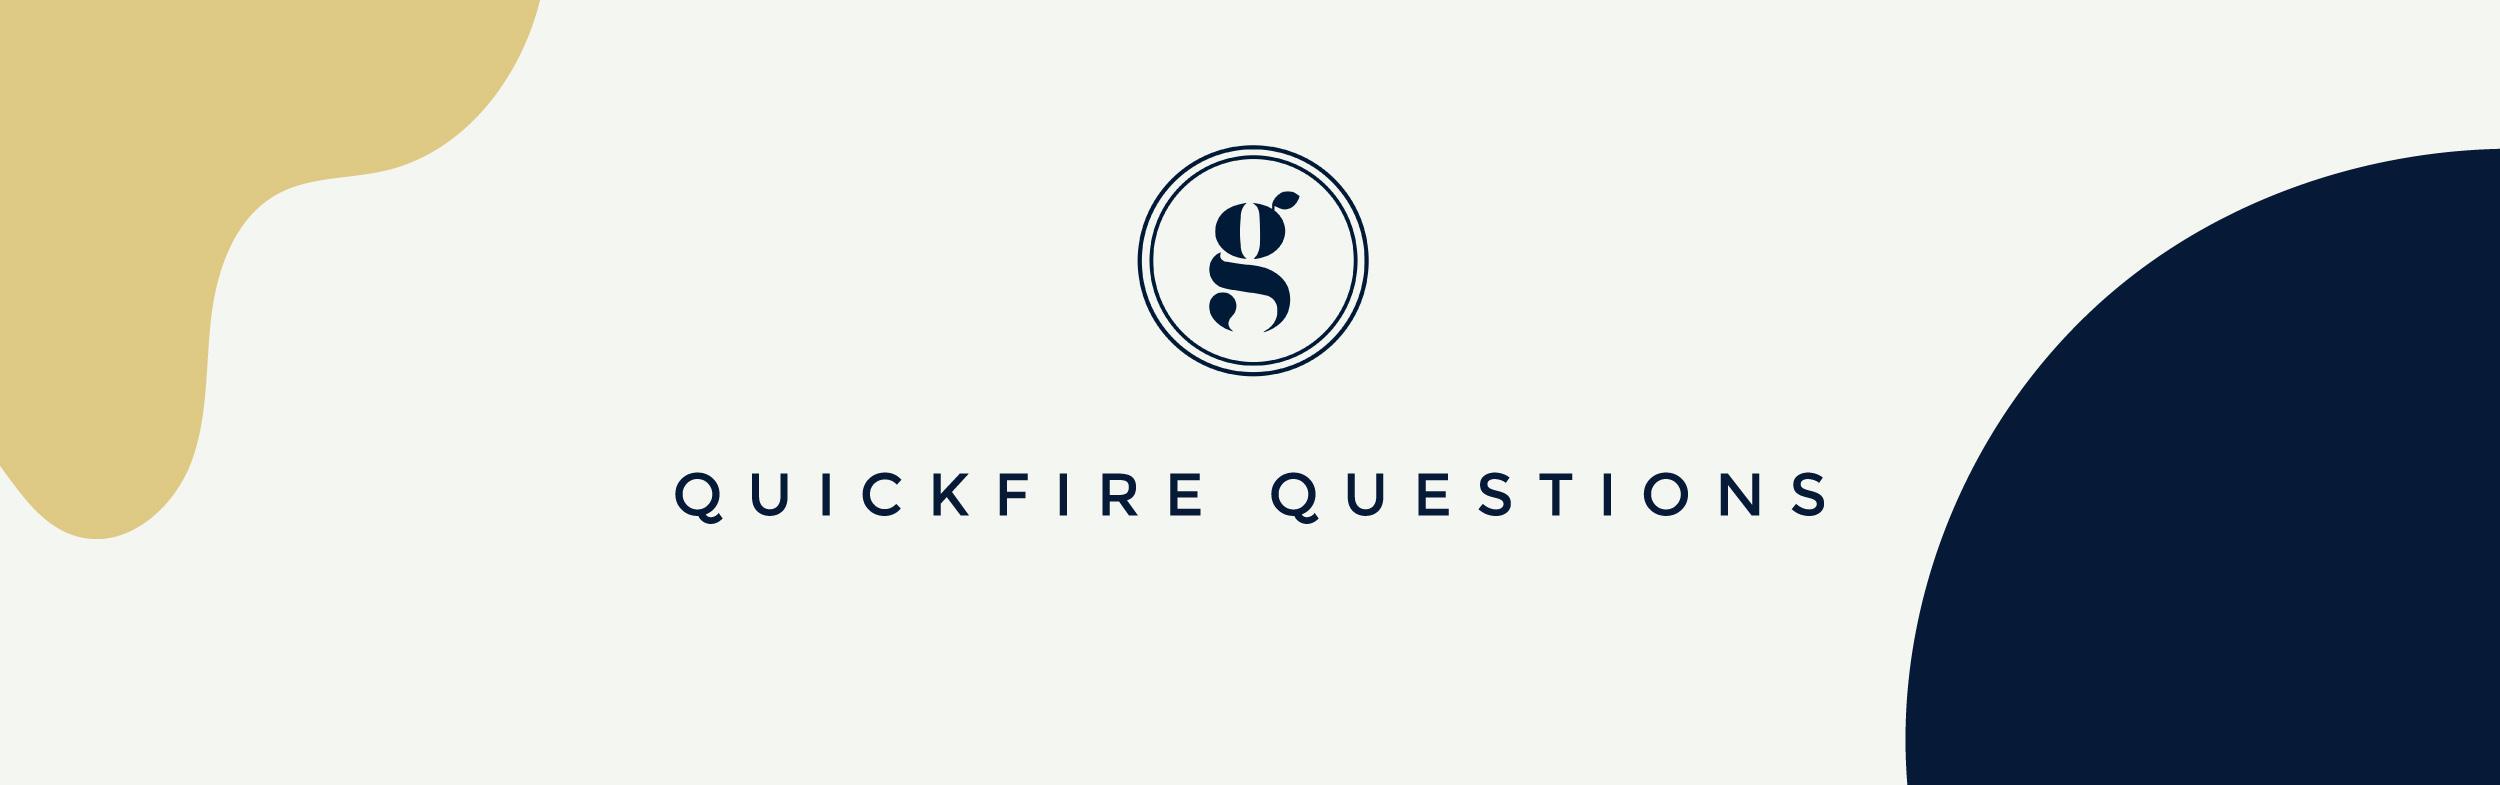 Gutsy UK Gut Health Q&A